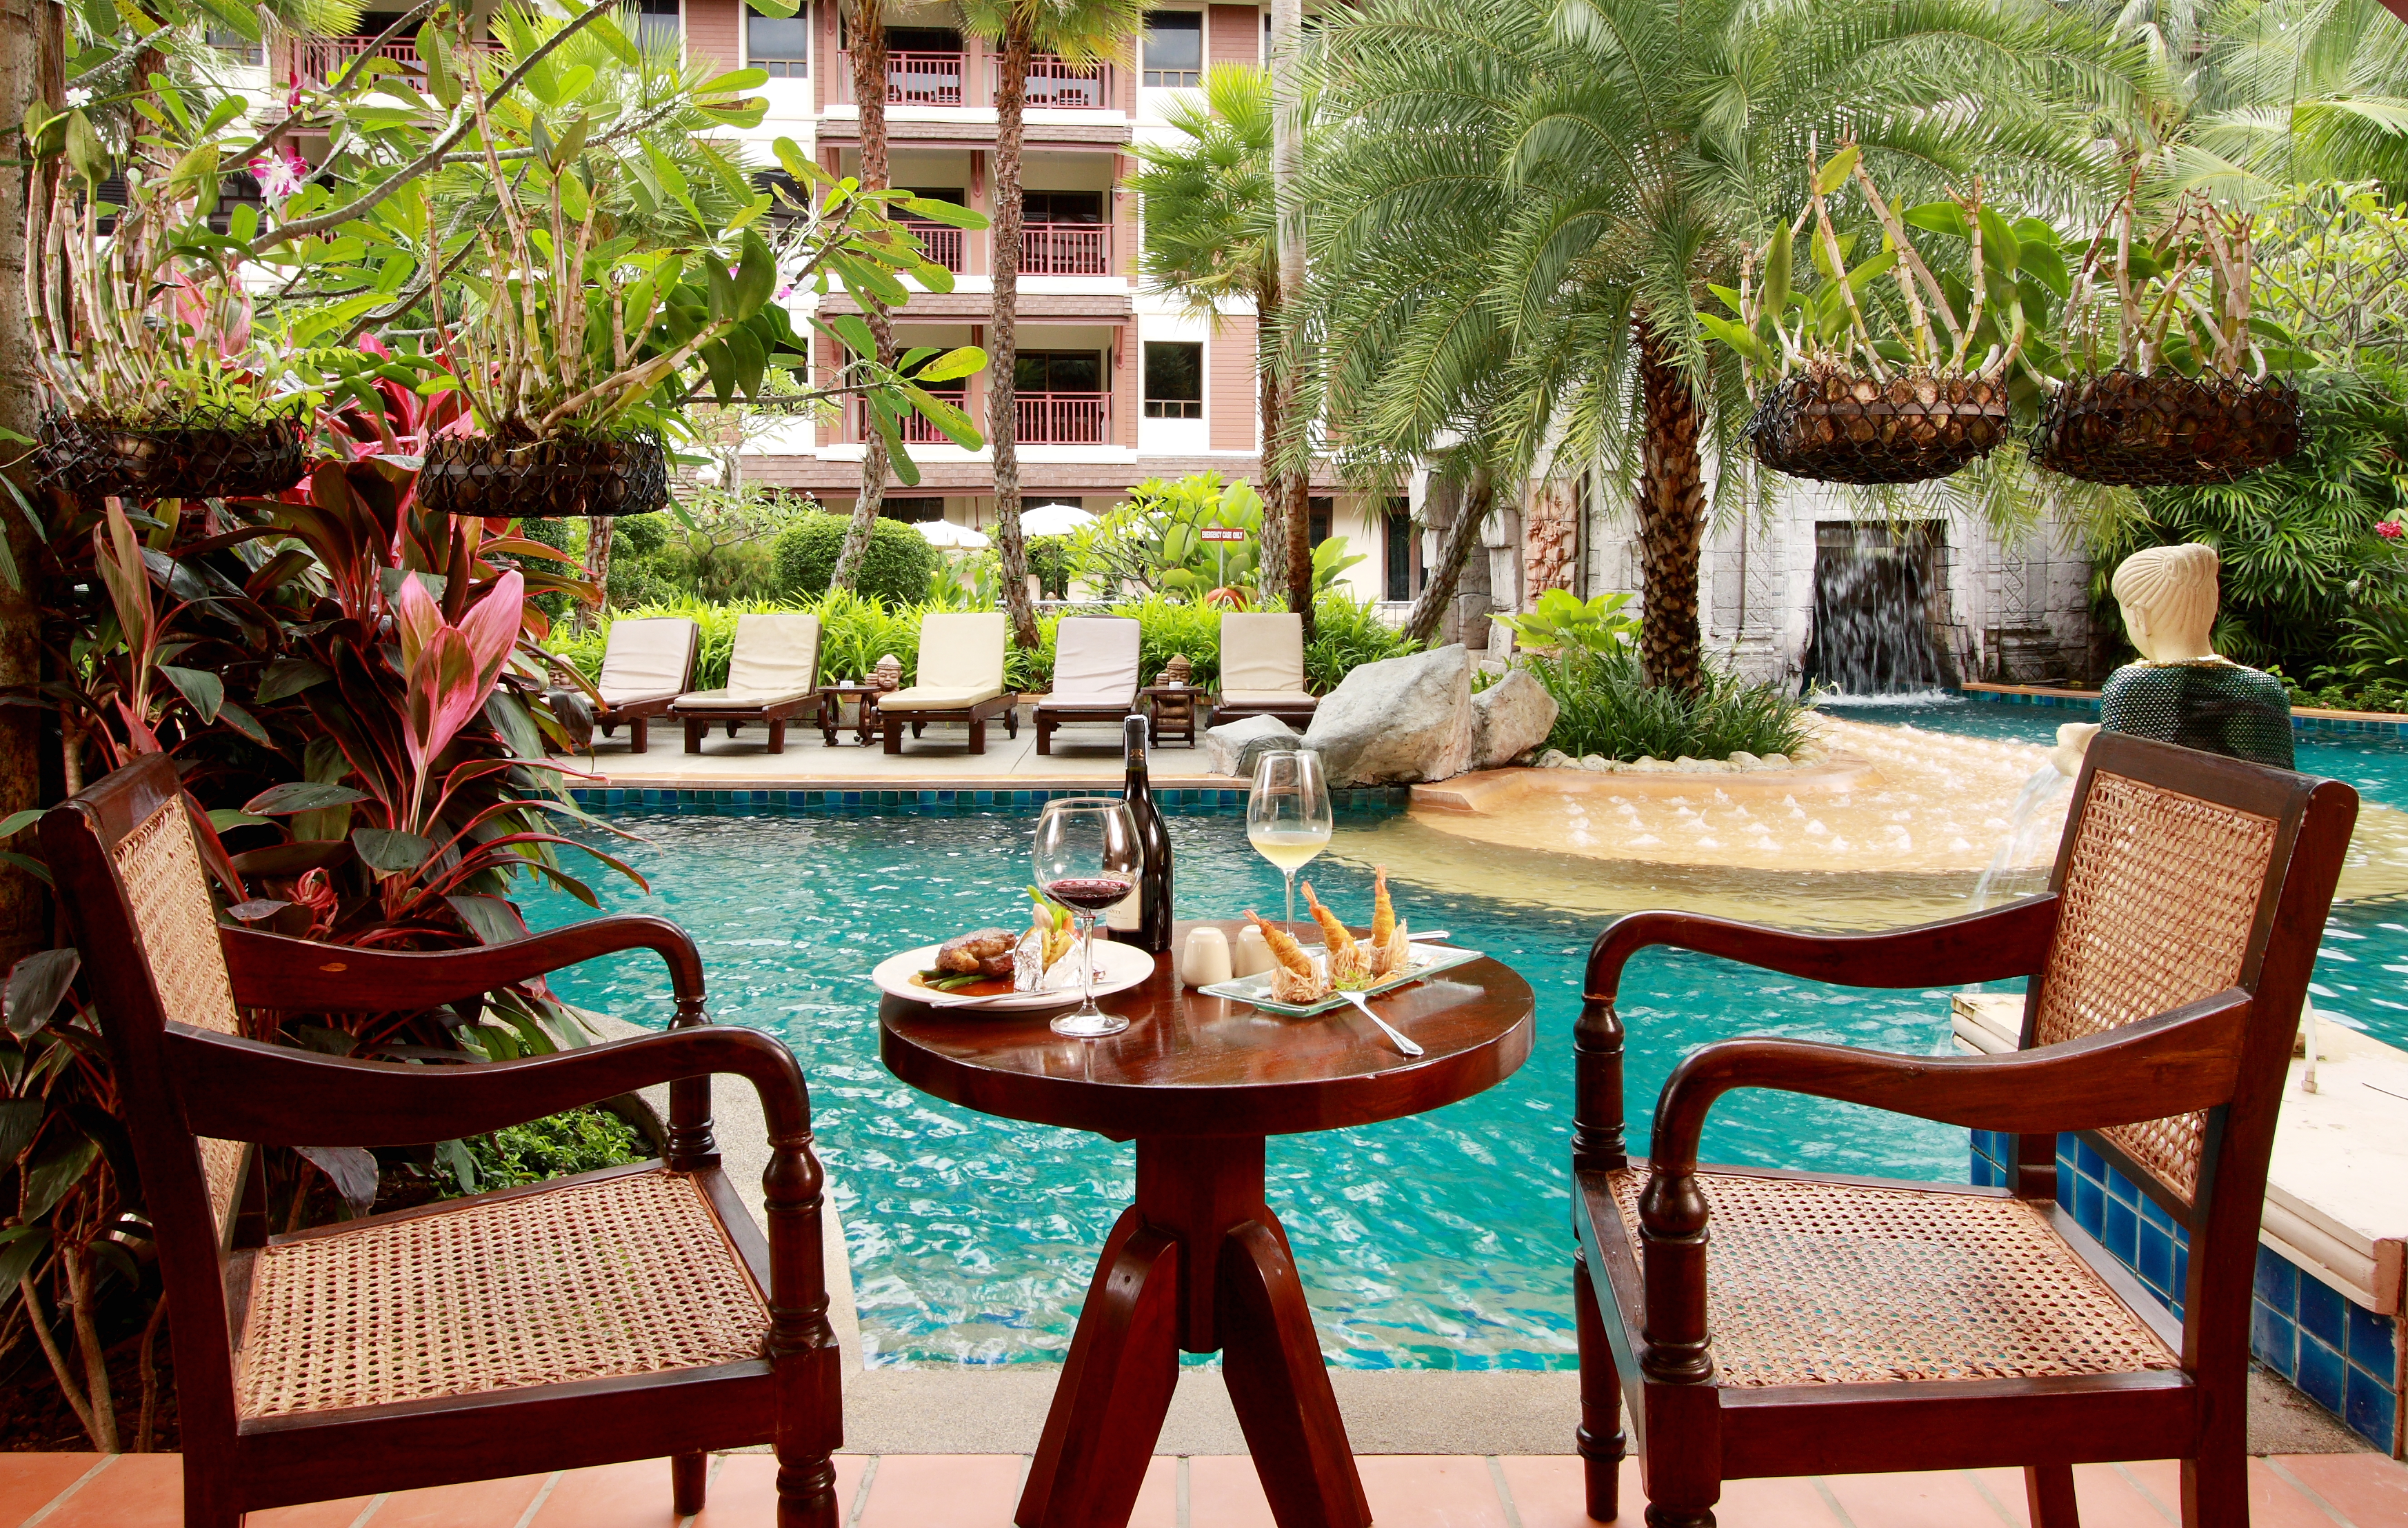 Hotel Kata Palm 3*superior - spiaggia di Kata